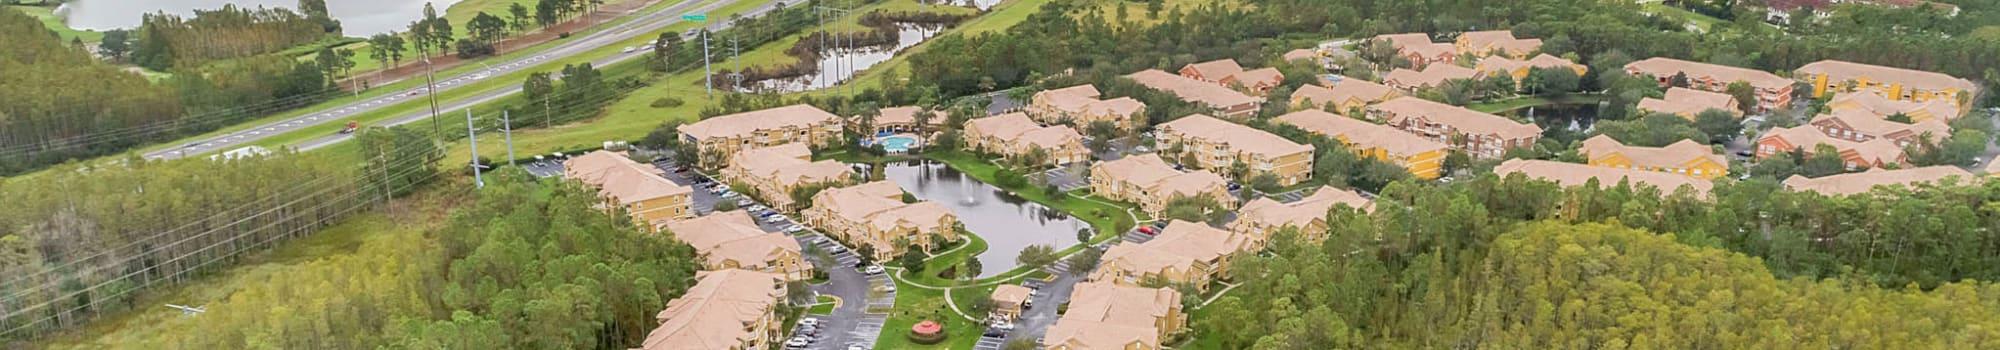 Neighborhood near Palms at World Gateway in Orlando, Florida